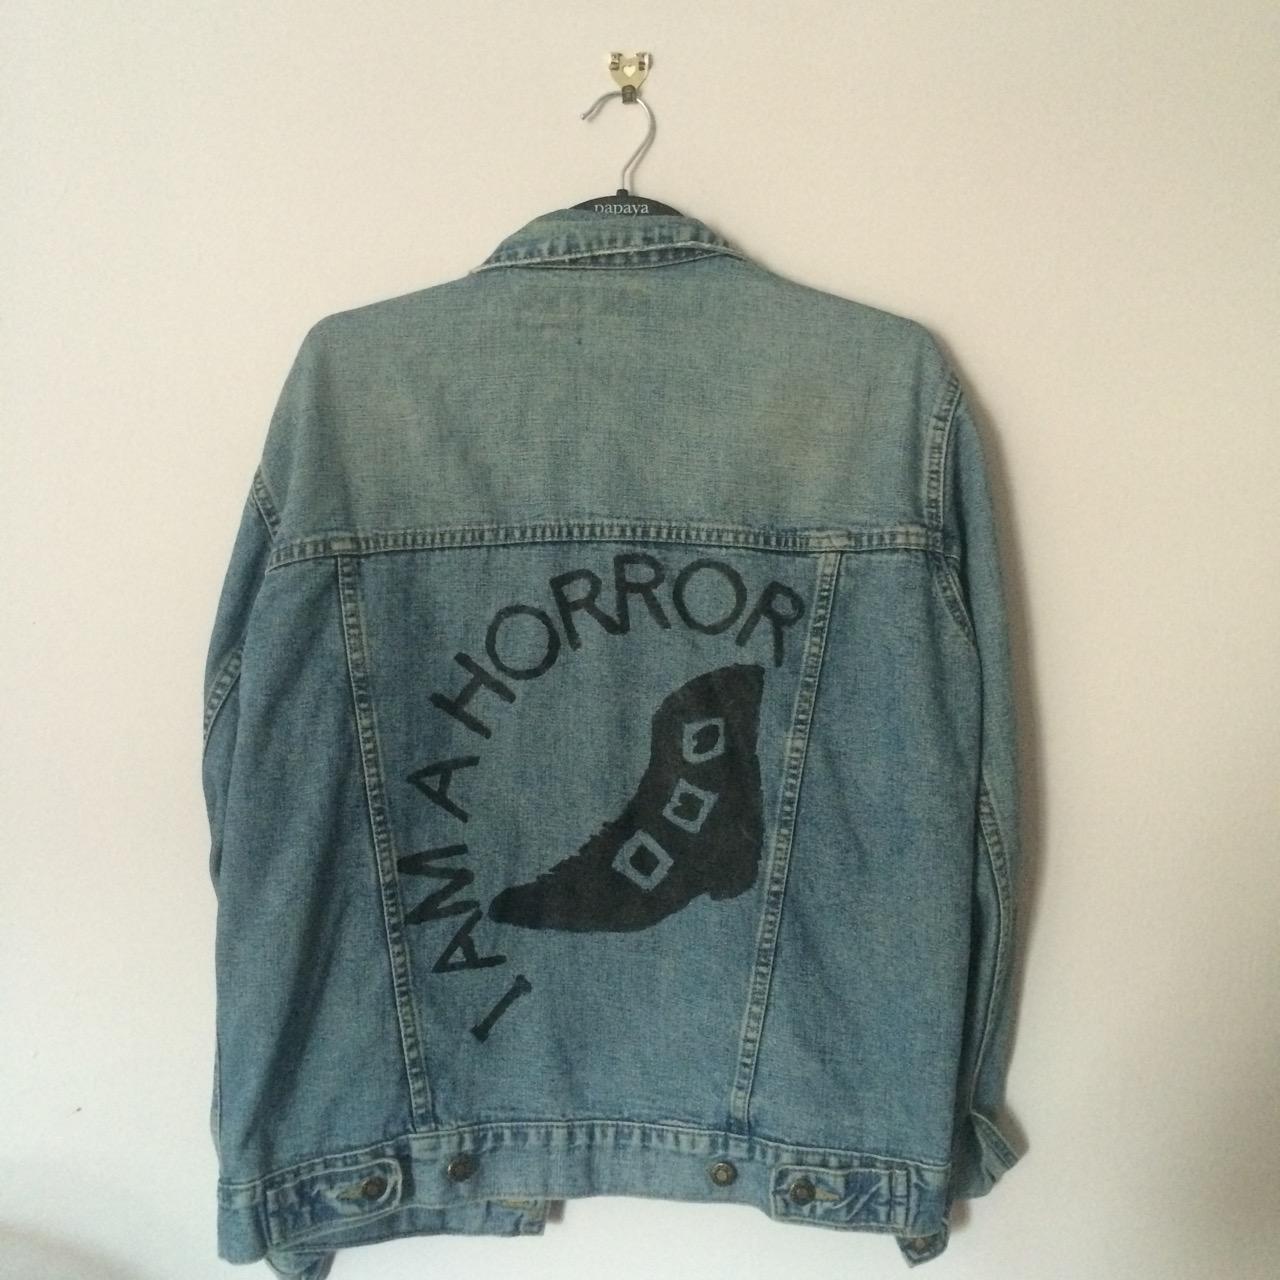 a9a64a650cdf1 I Am A Horror denim jacket on Storenvy